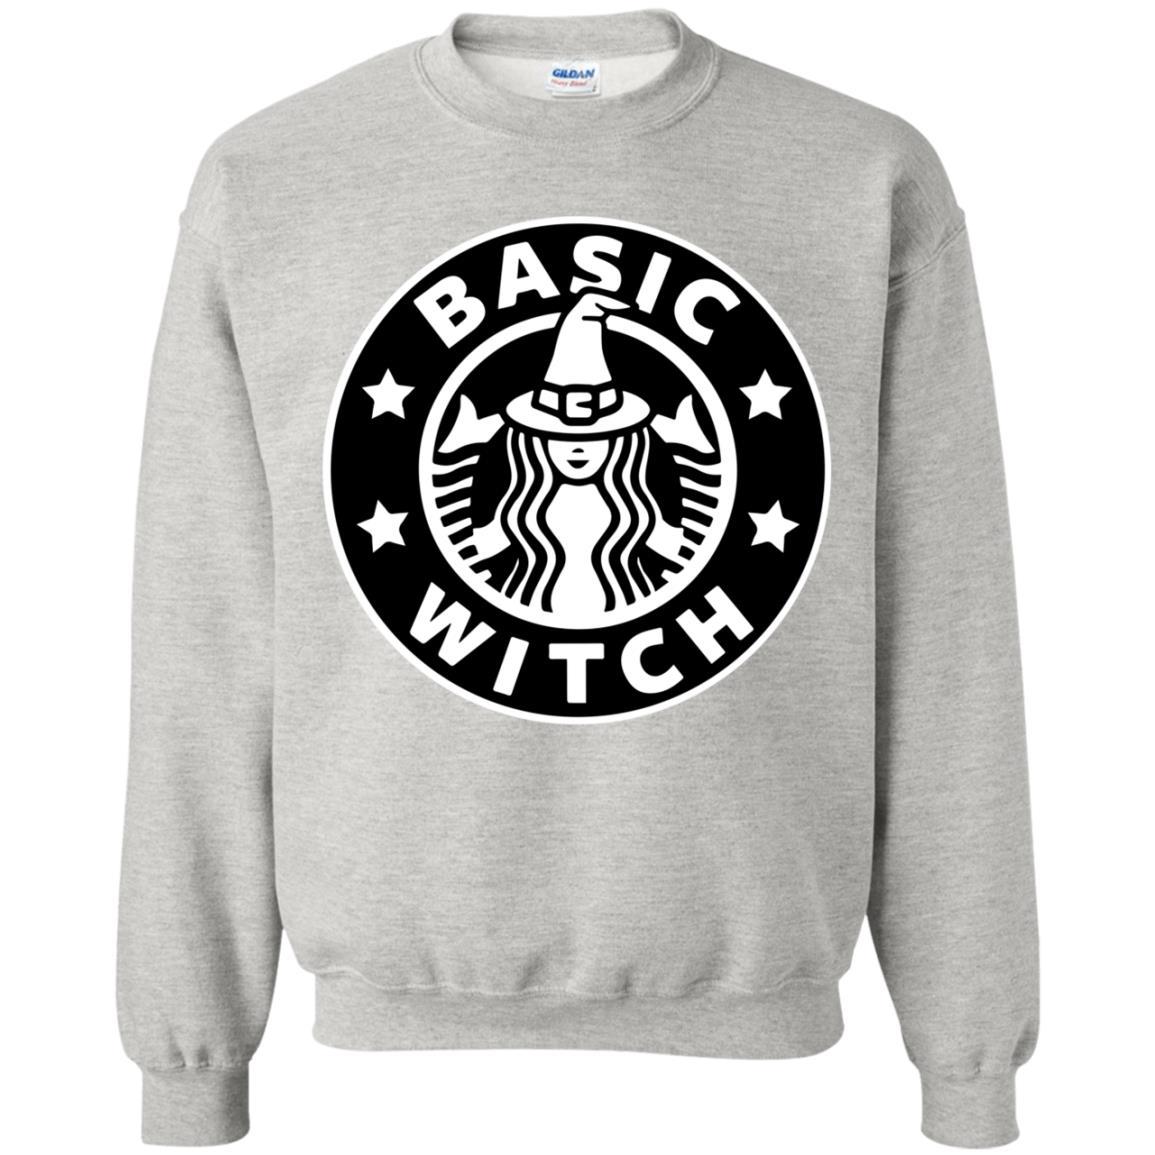 image 1020 - Basic Witch Shirt, Halloween Starbuck parody